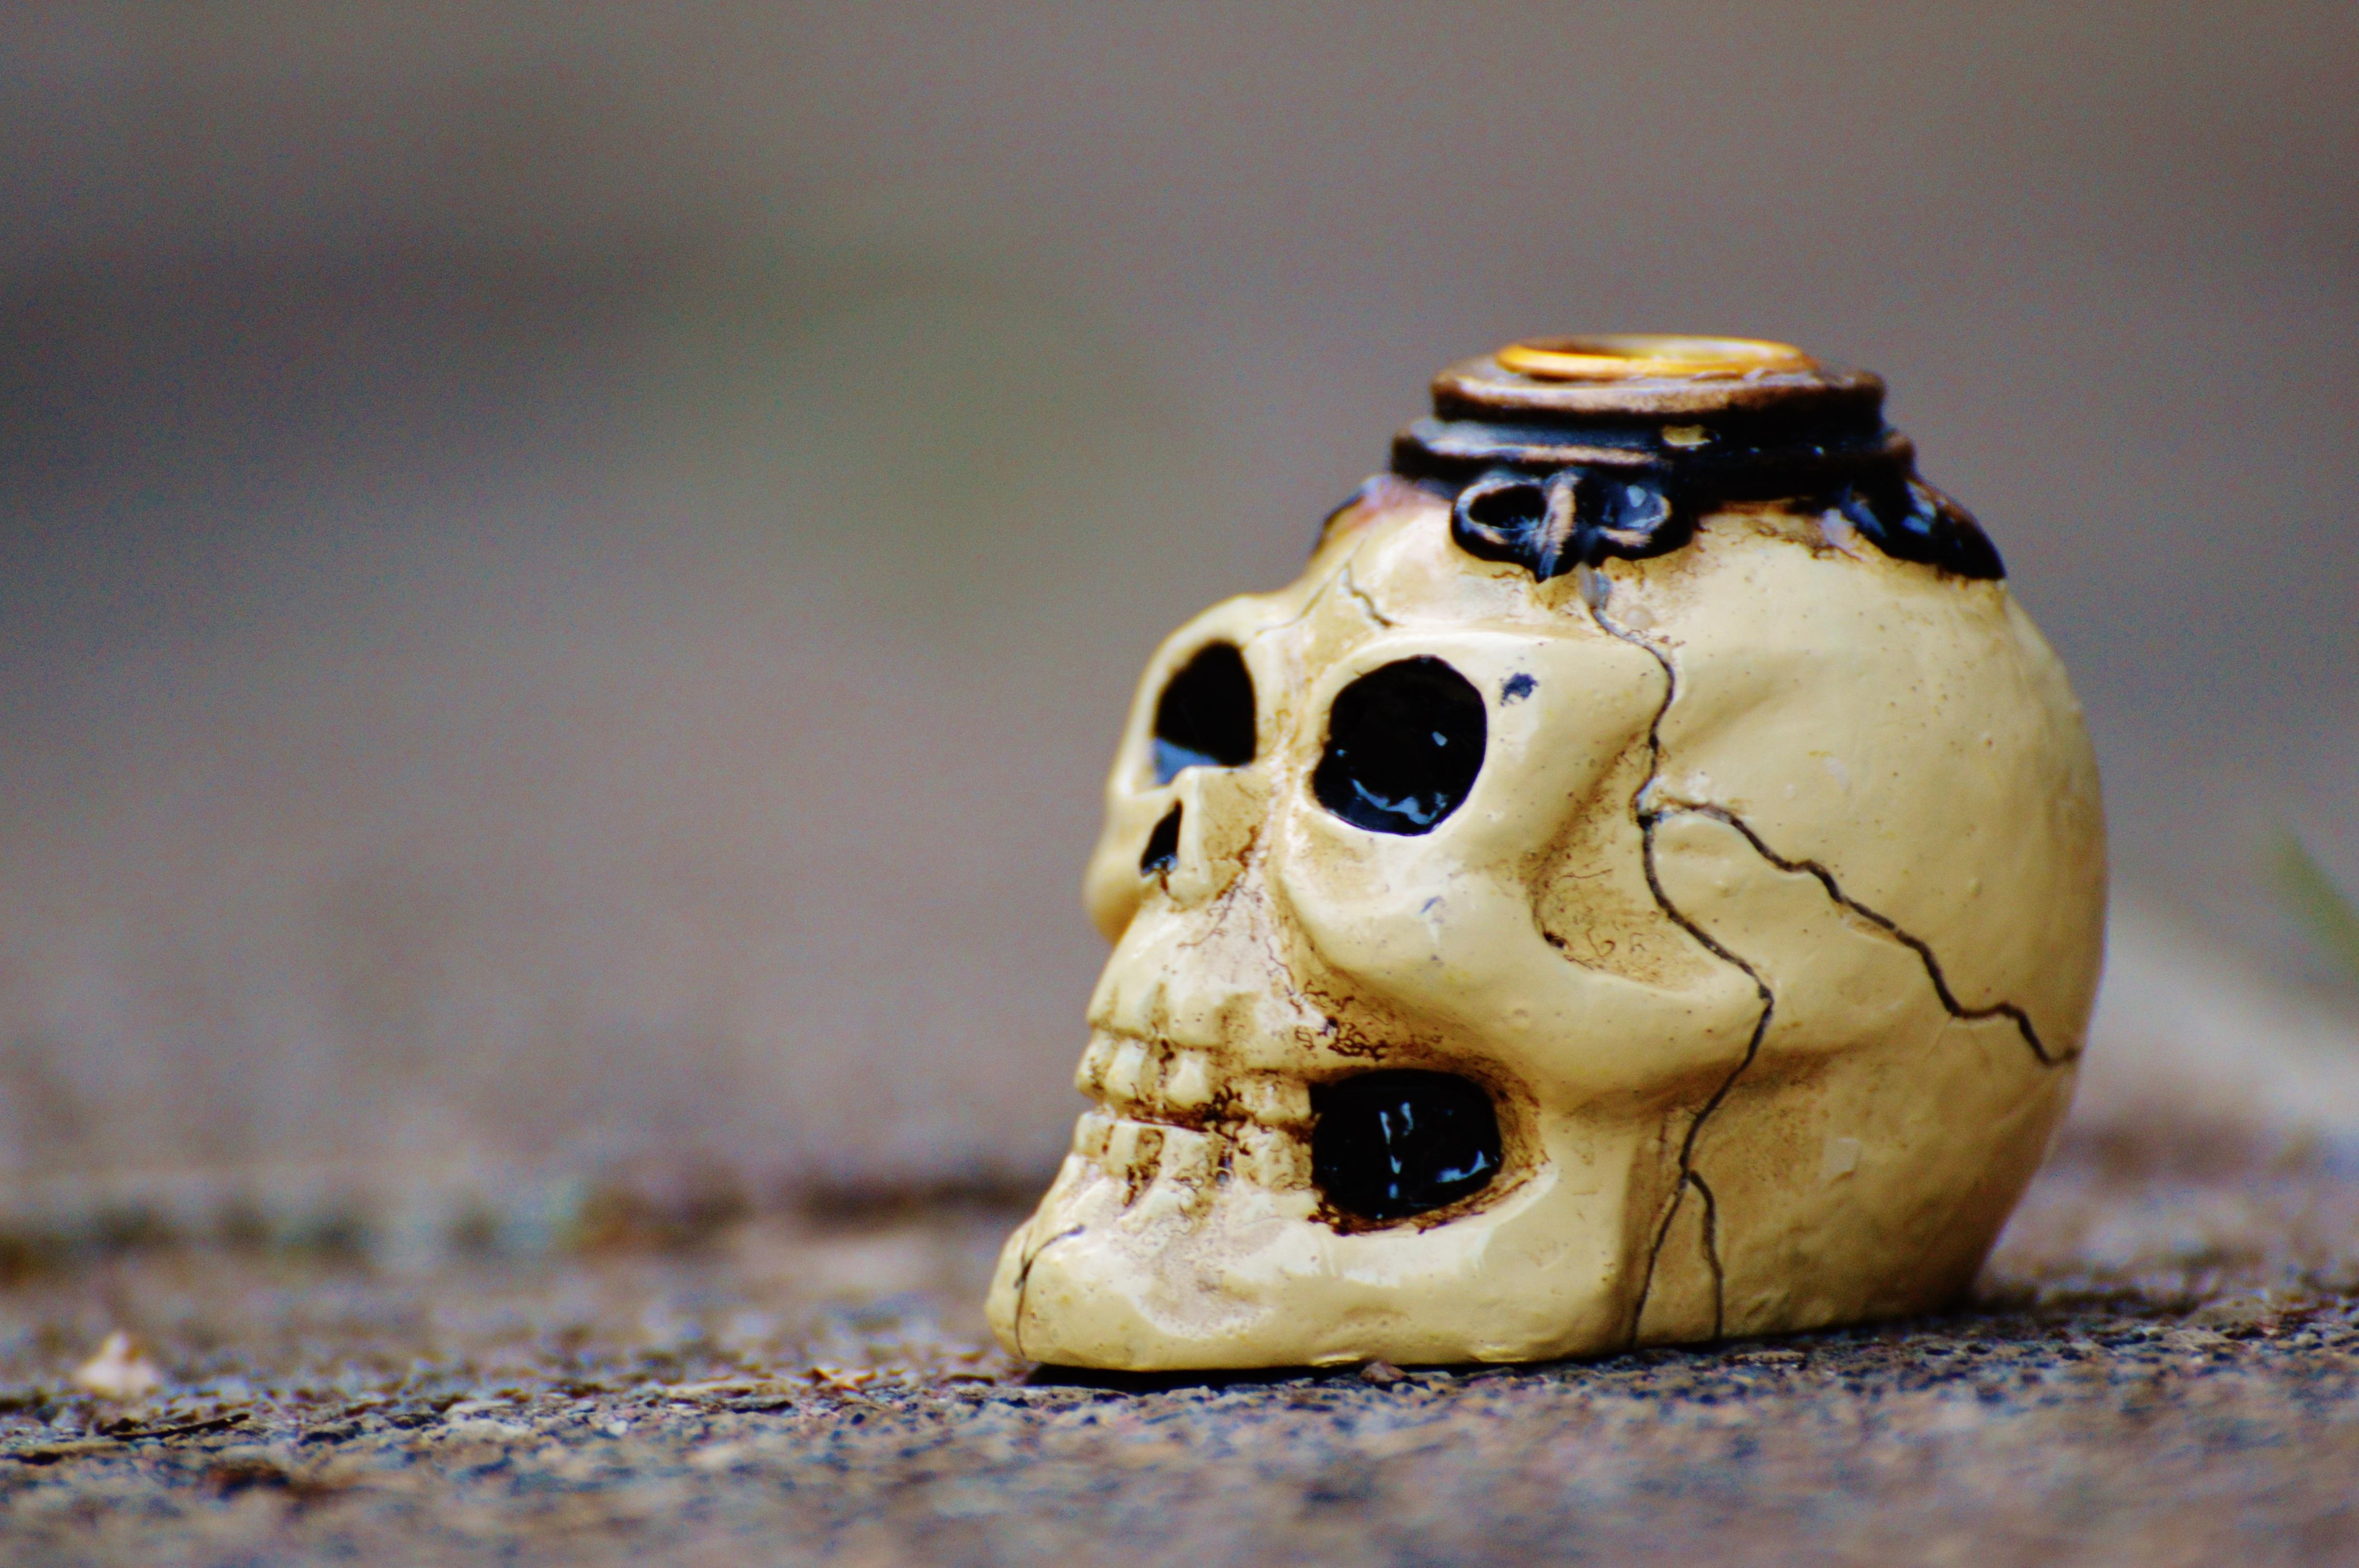 Kostenlose foto : Keramik, Halloween, Tod, Schädel, Material ...